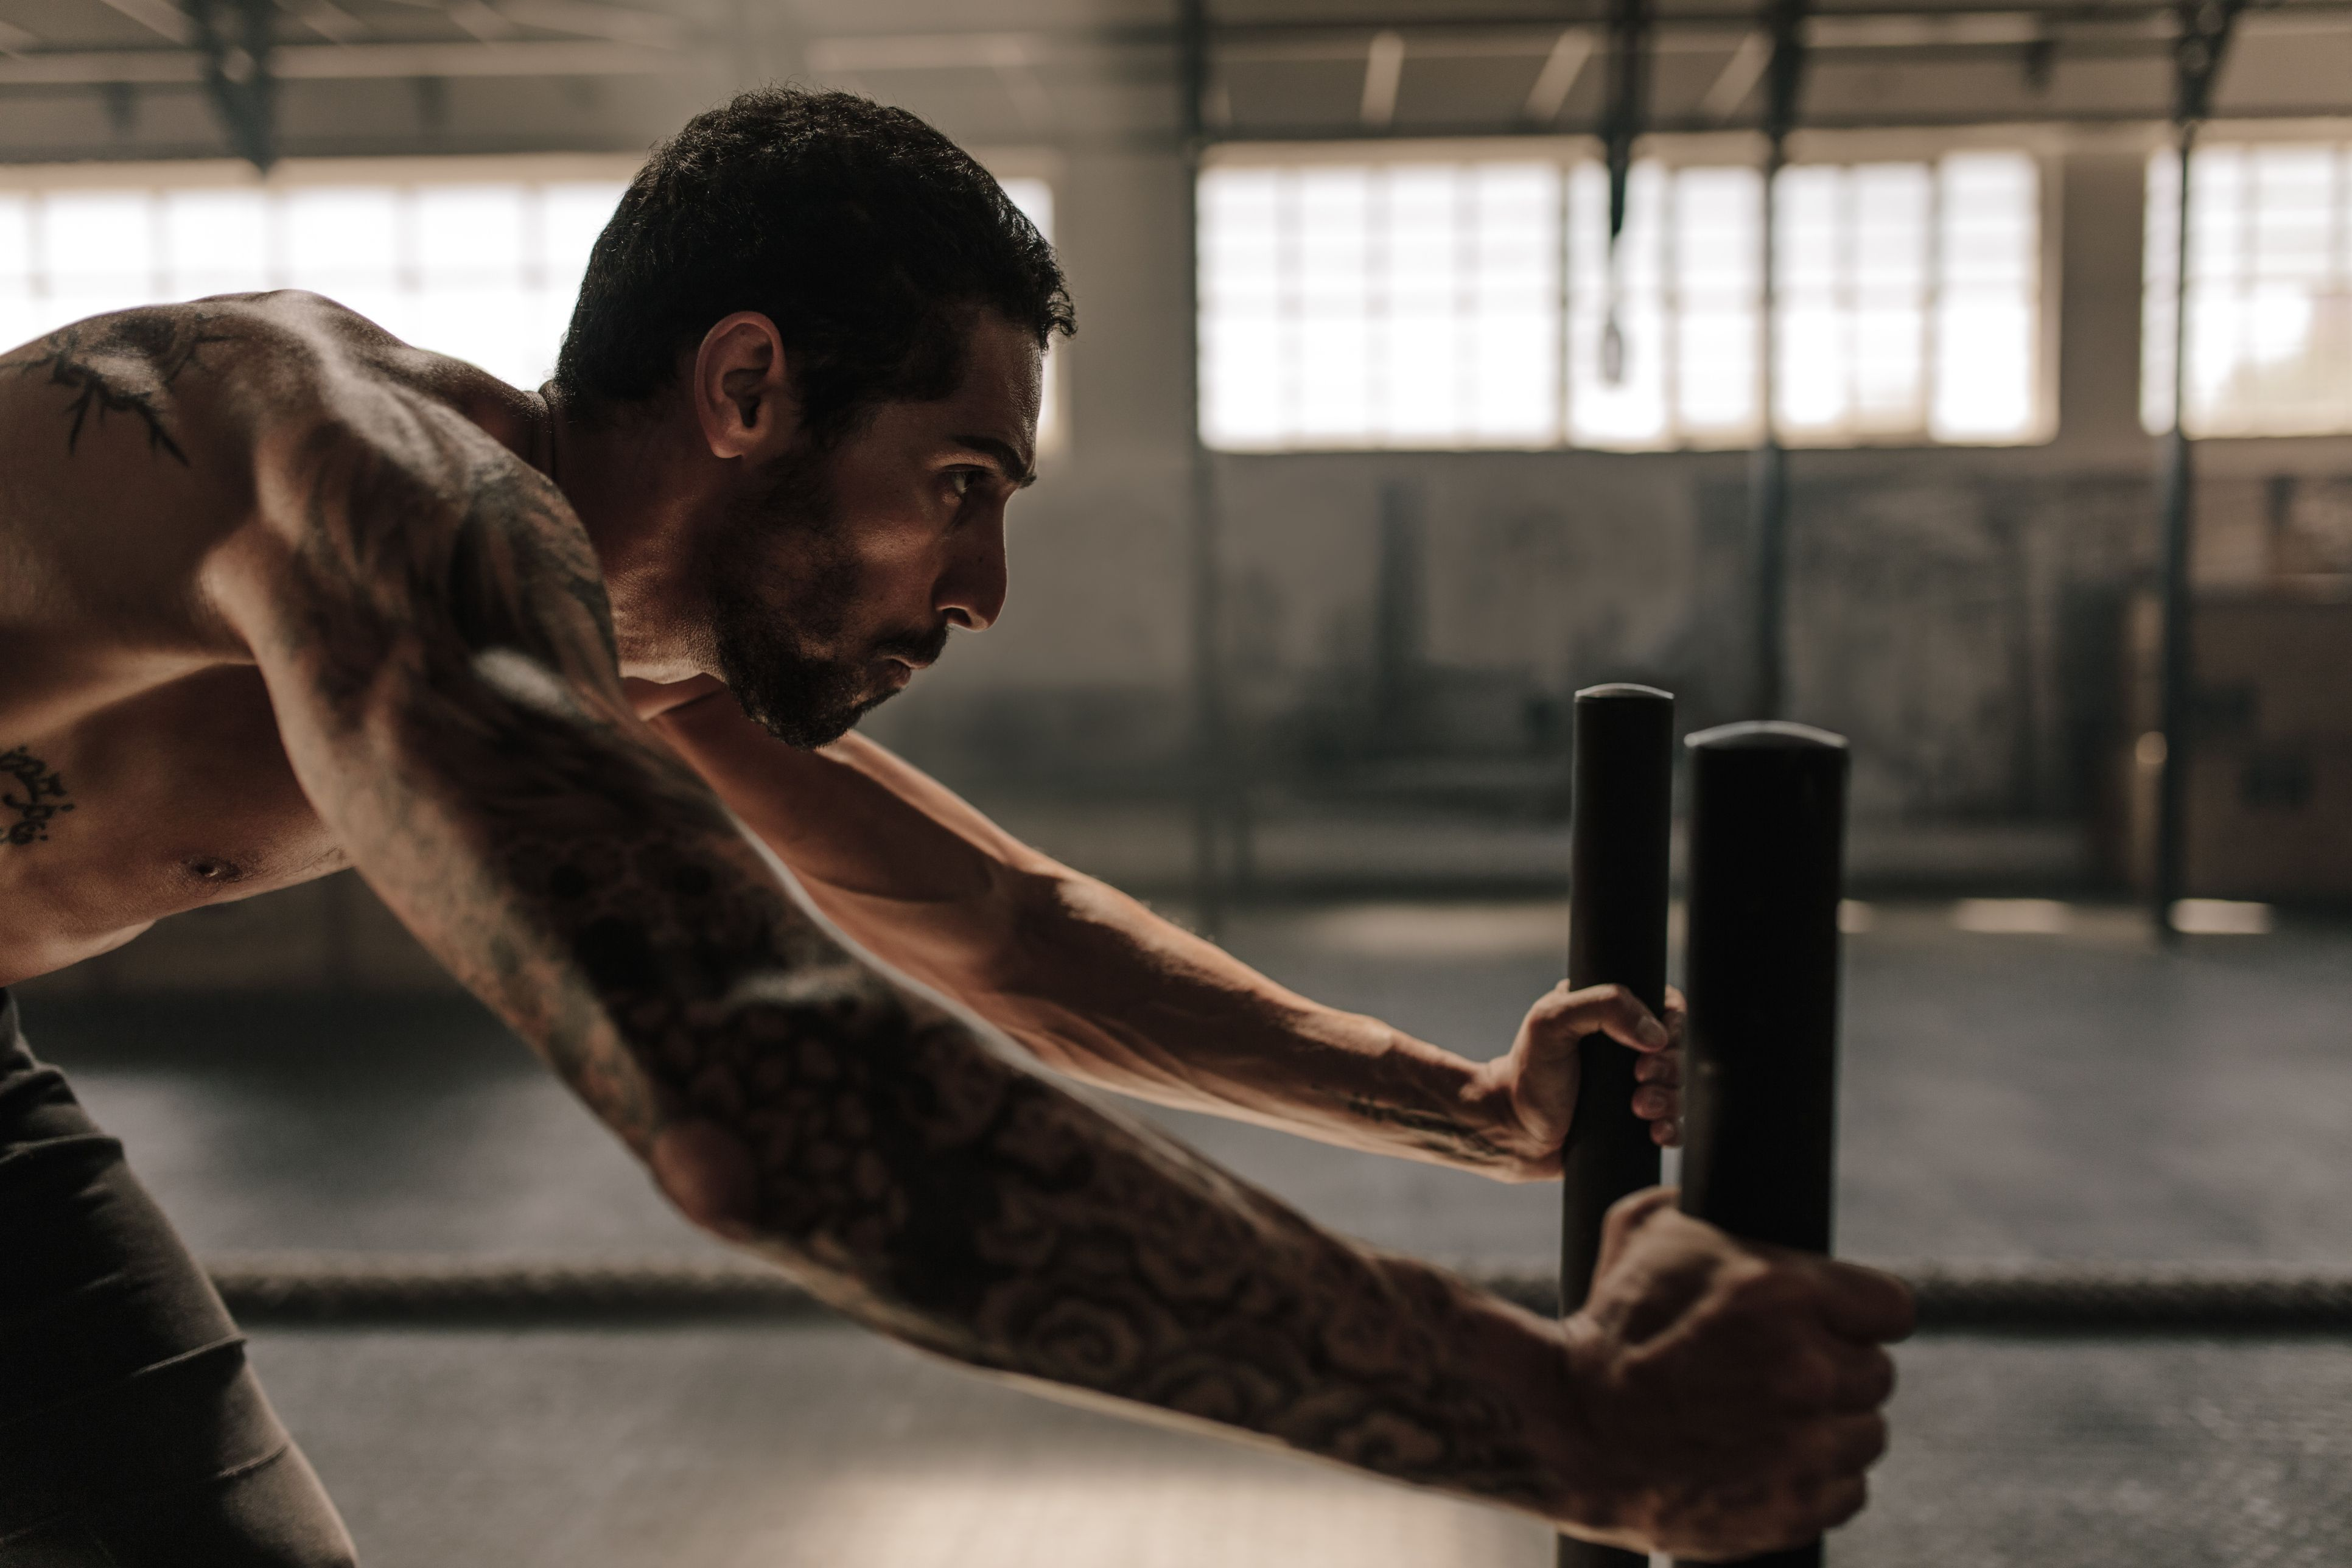 Burn fat, build muscle